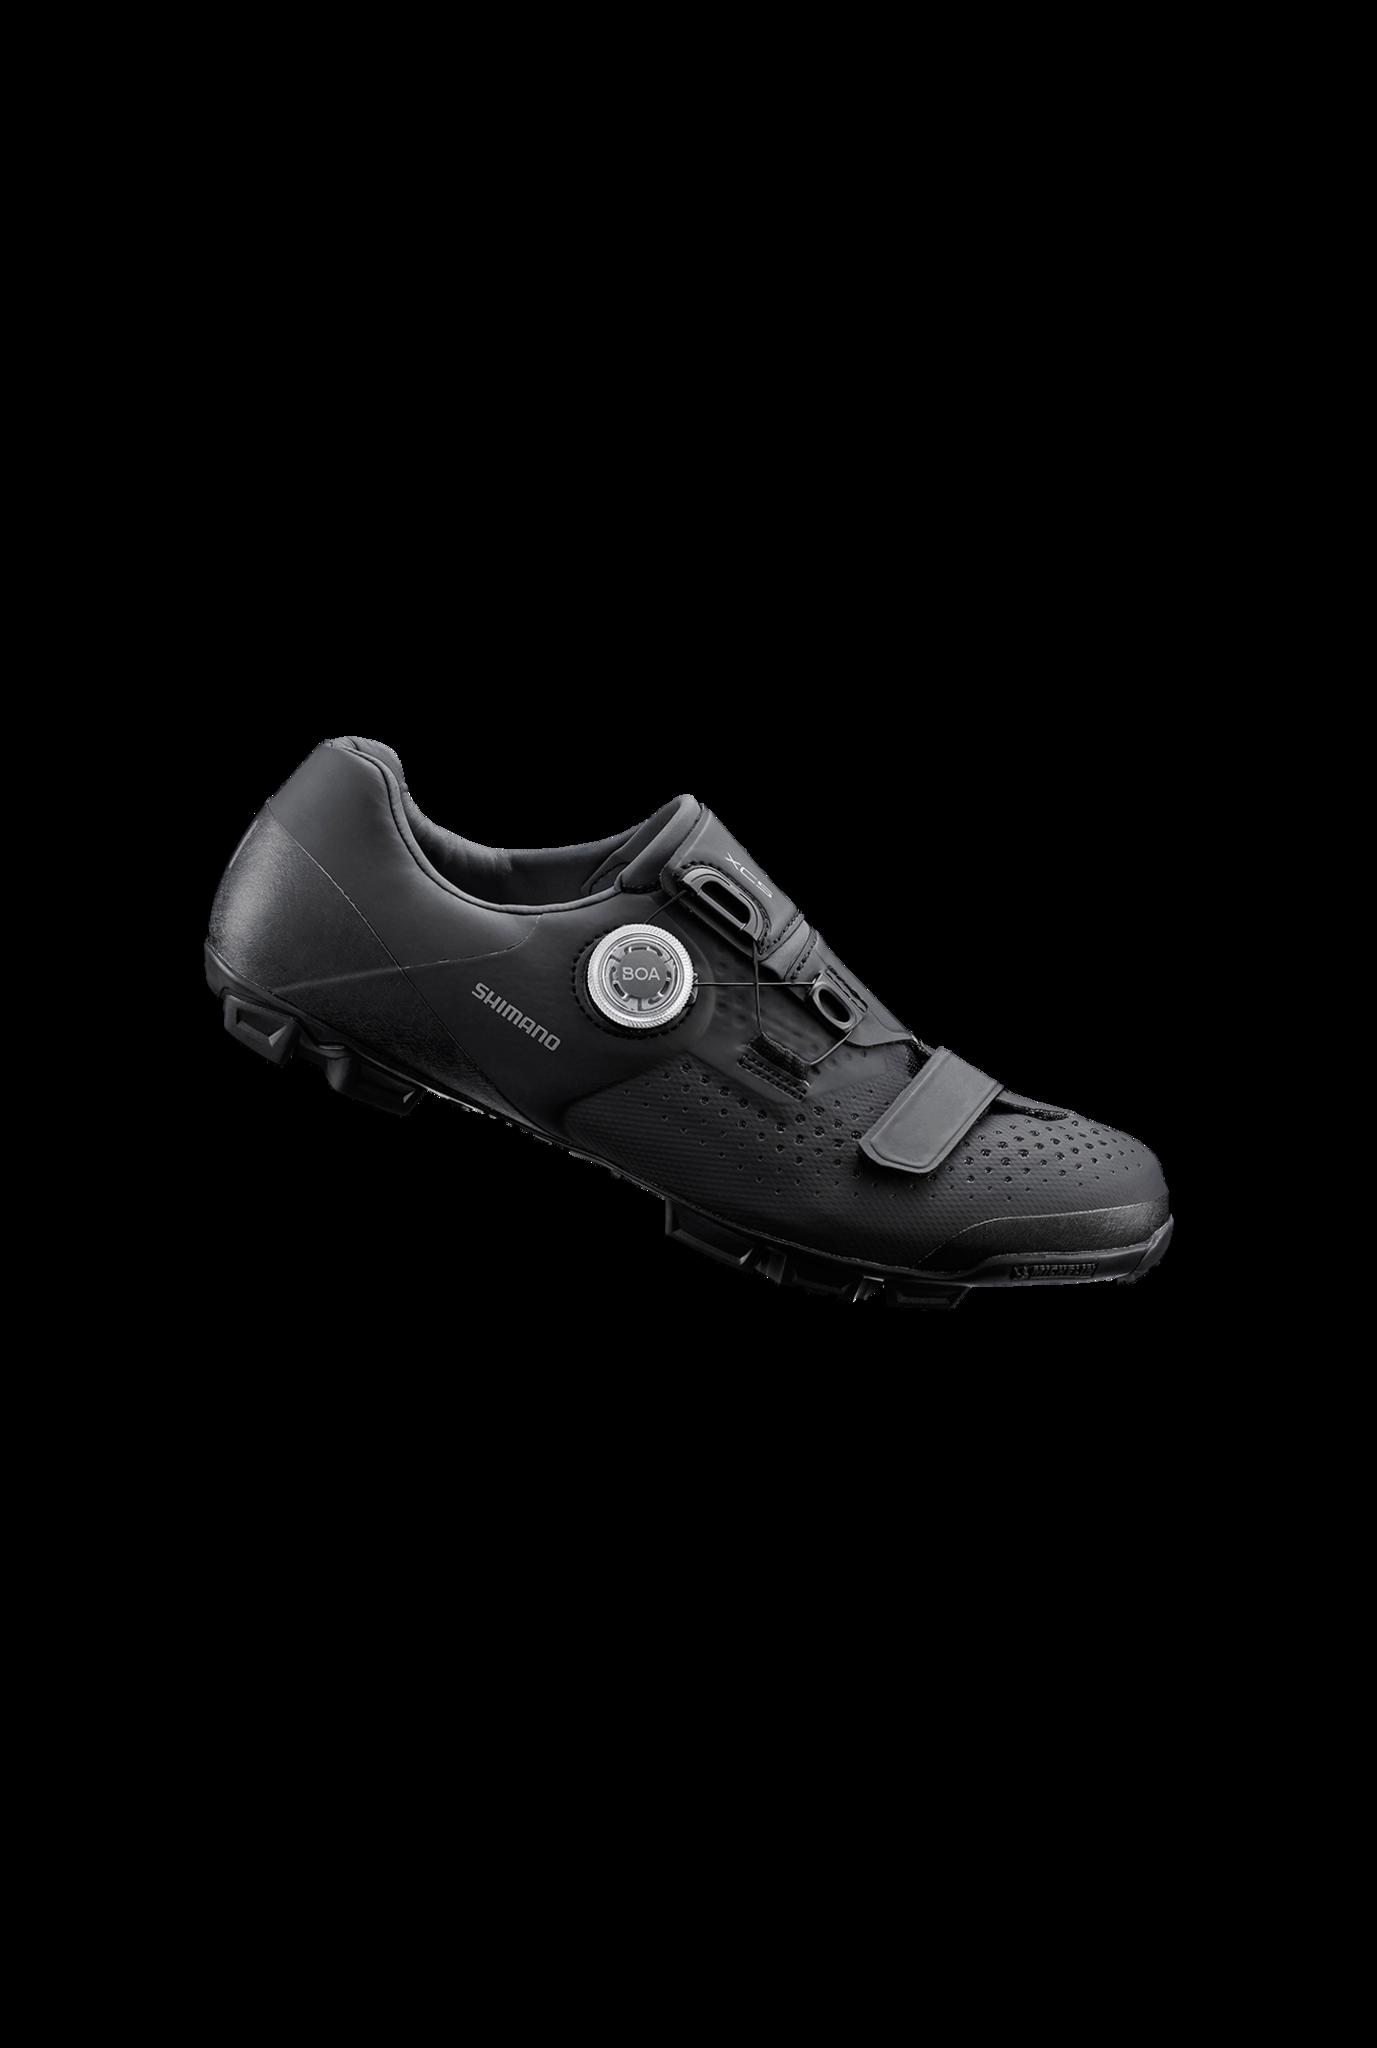 Schoenen XC501 Zwart-1